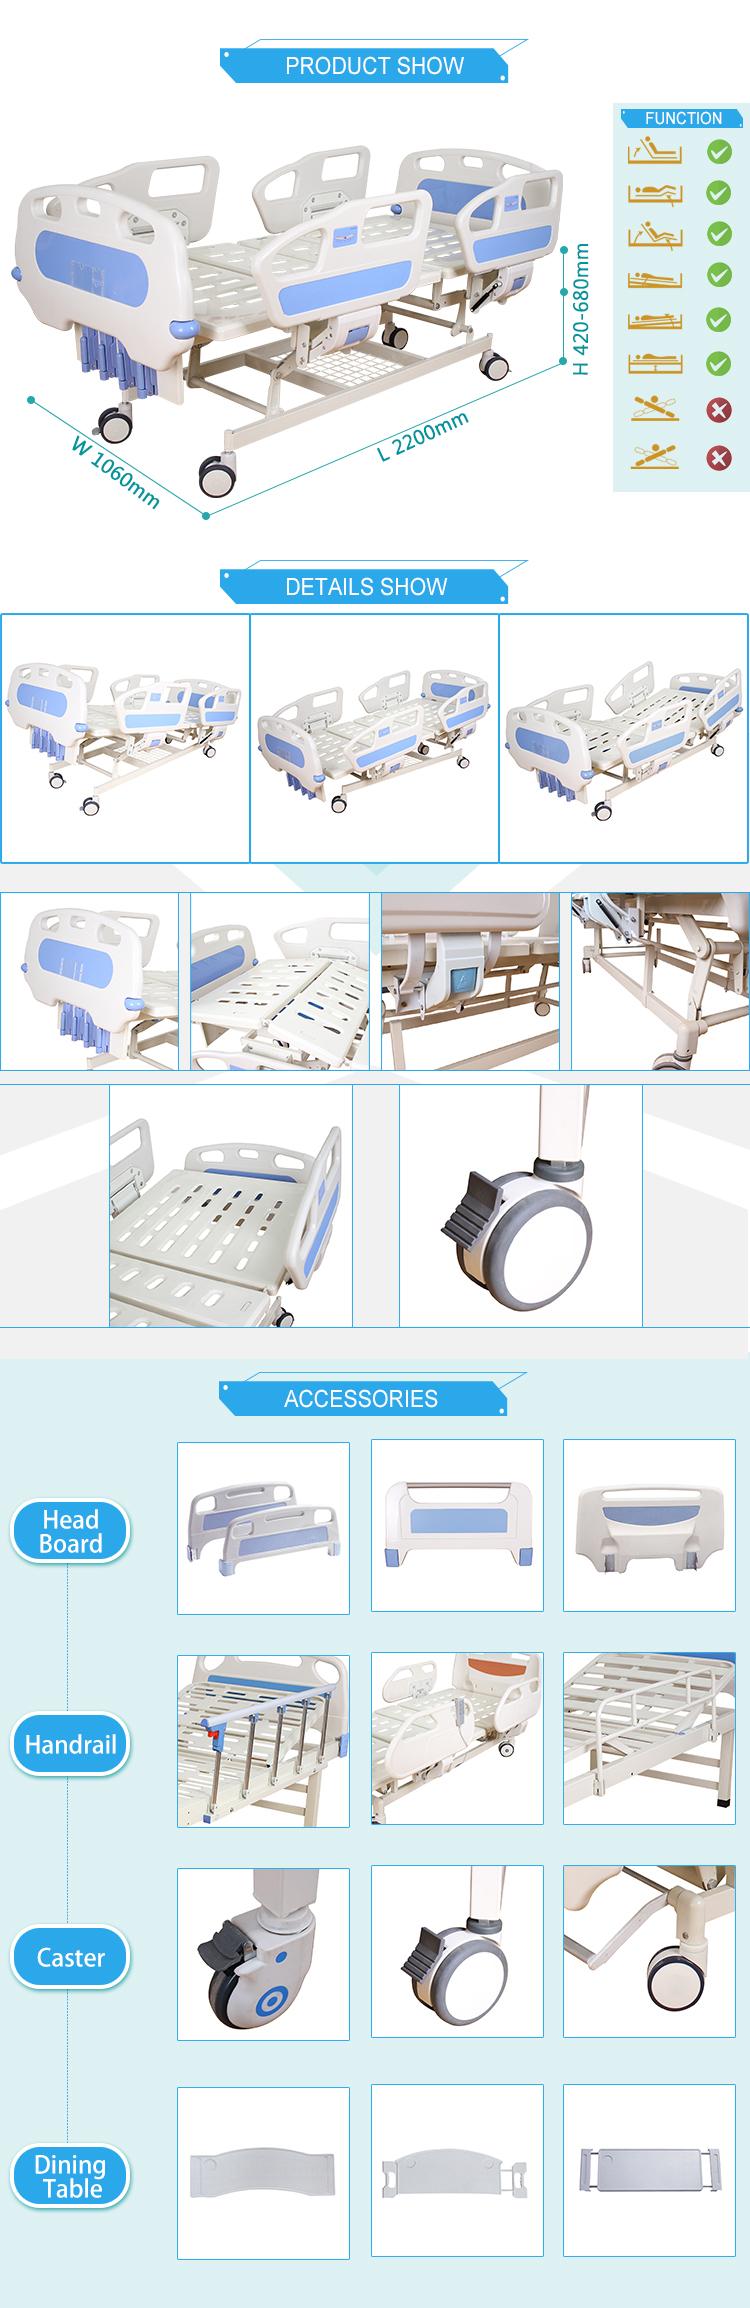 C11 Abs Headboard 4 Cranks Best Price Manual Medical Hospital Bed ...